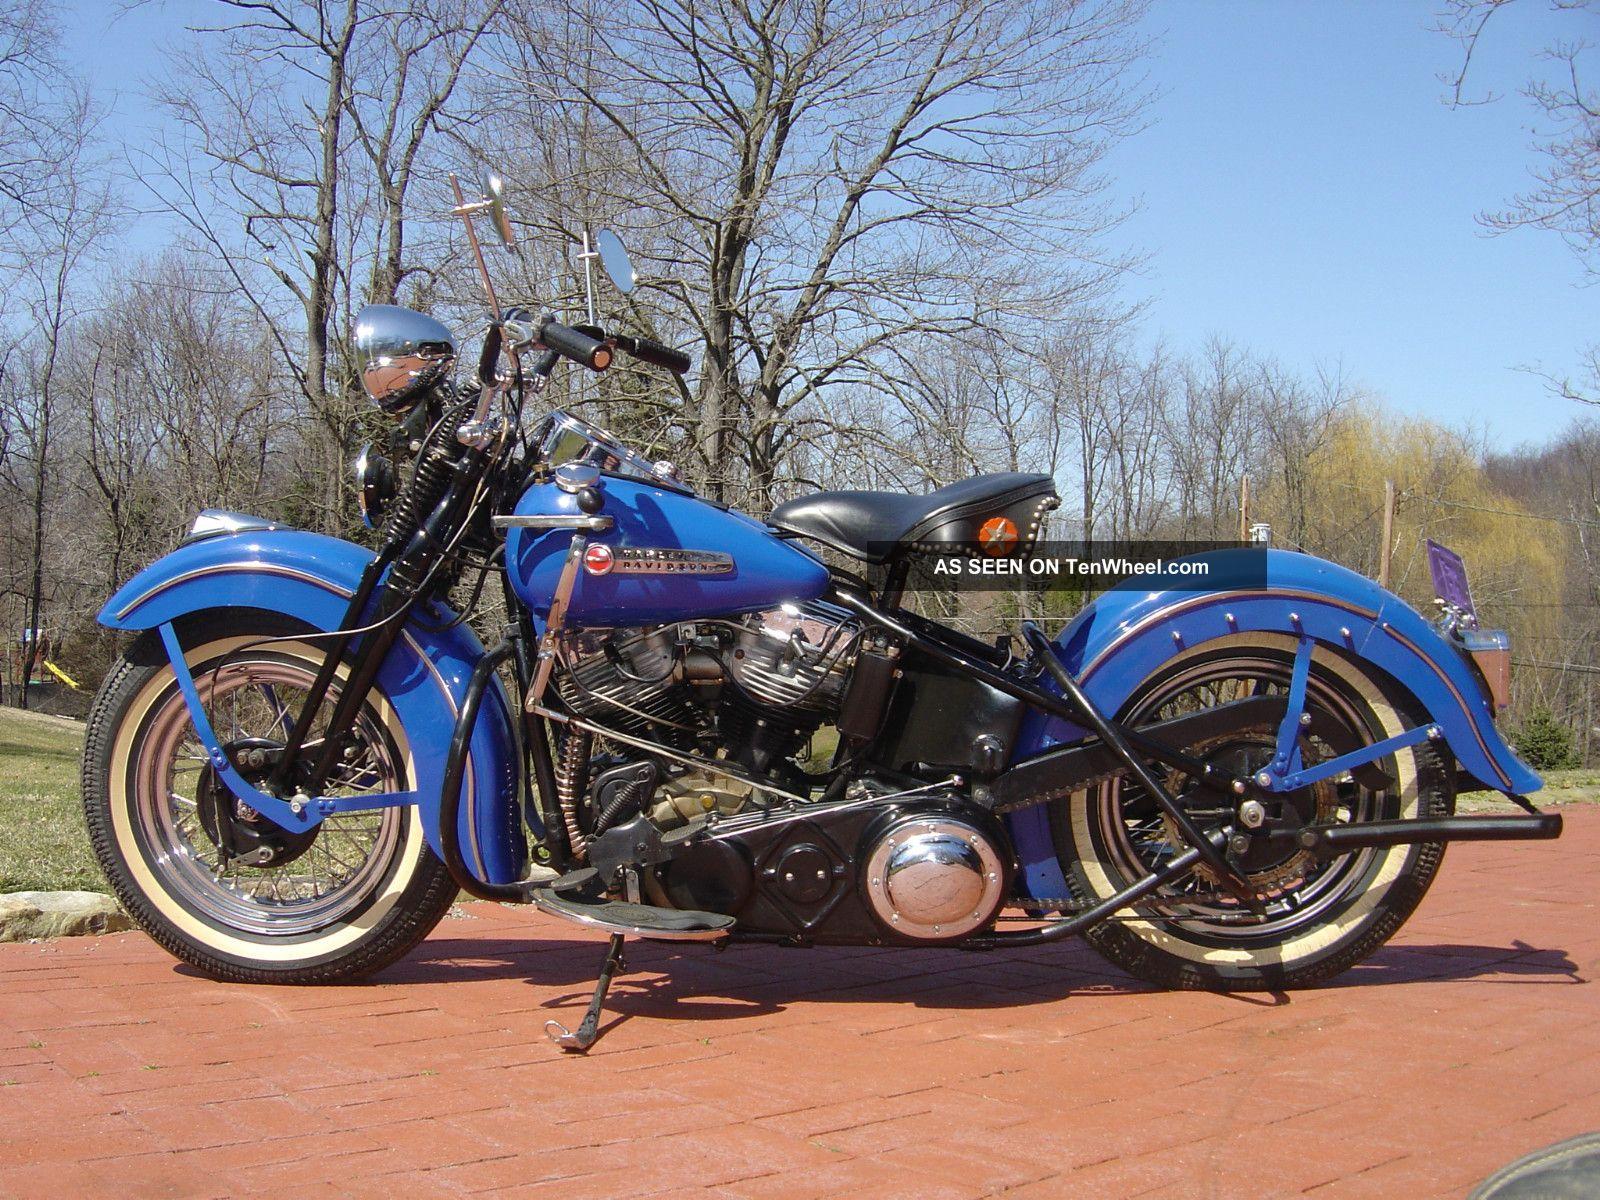 1948 Harley Davidson Fl Pan Head Matching Numbers Bike Other photo